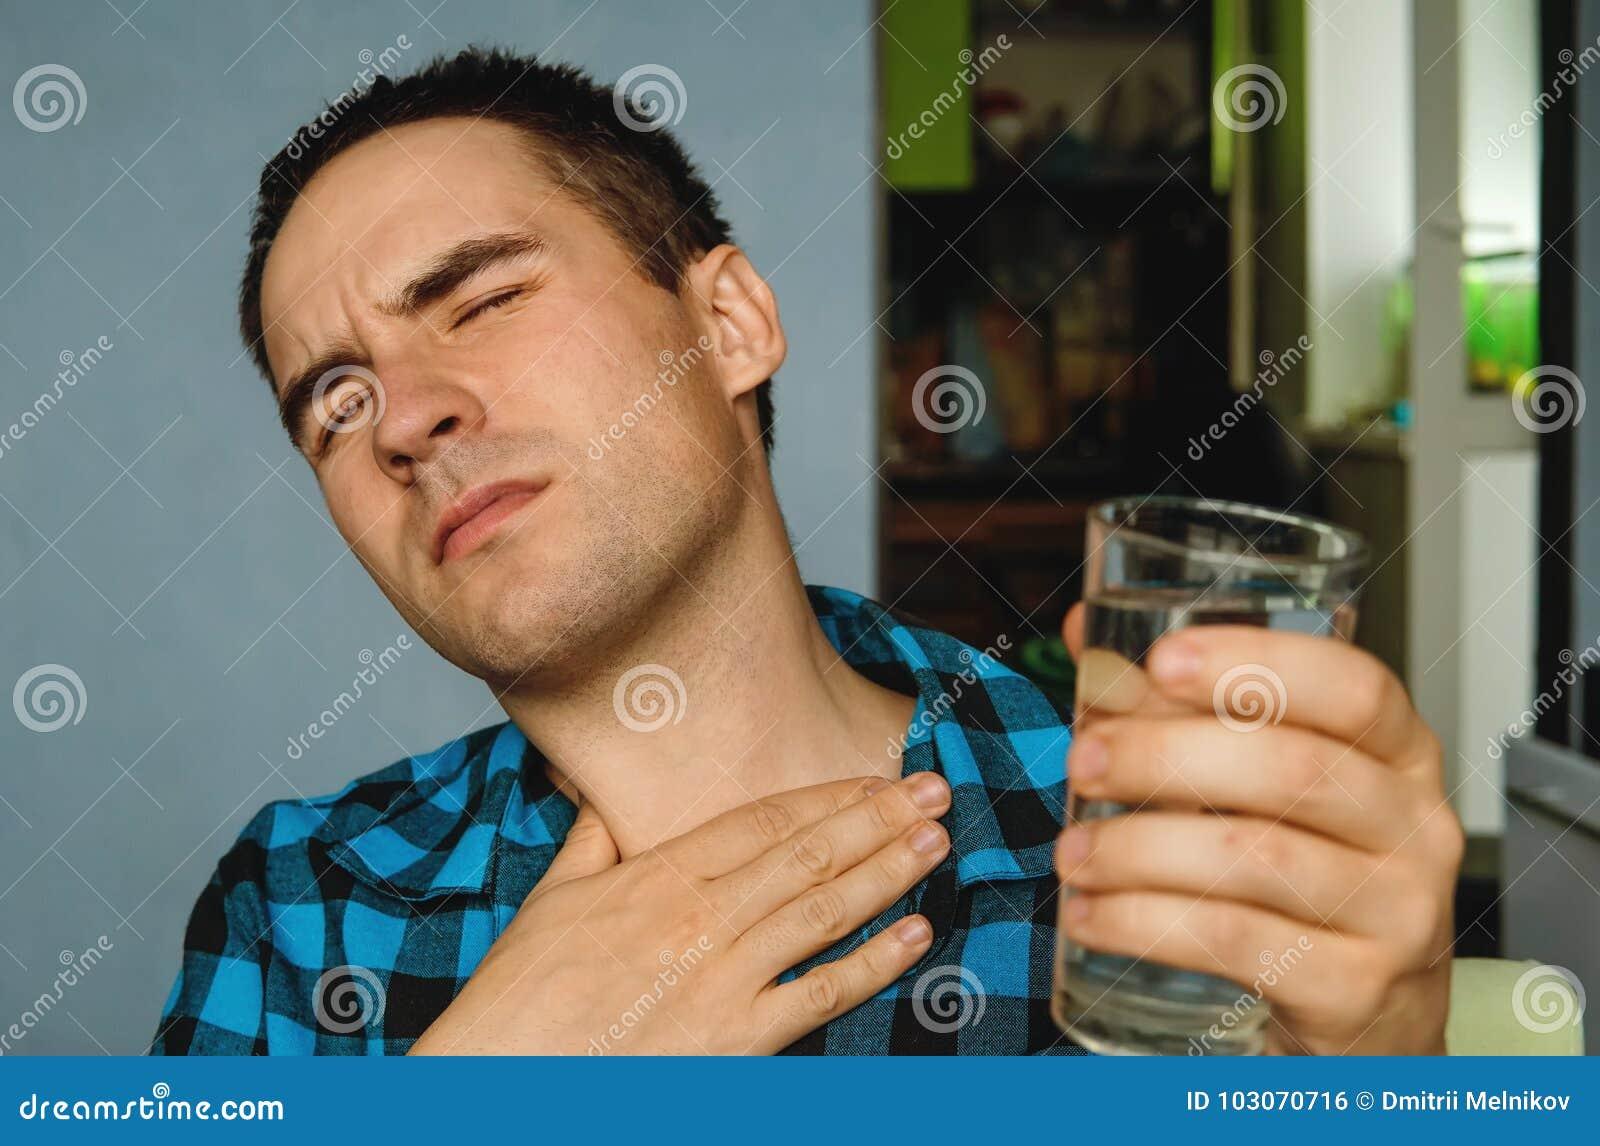 痛苦和喉咙痛